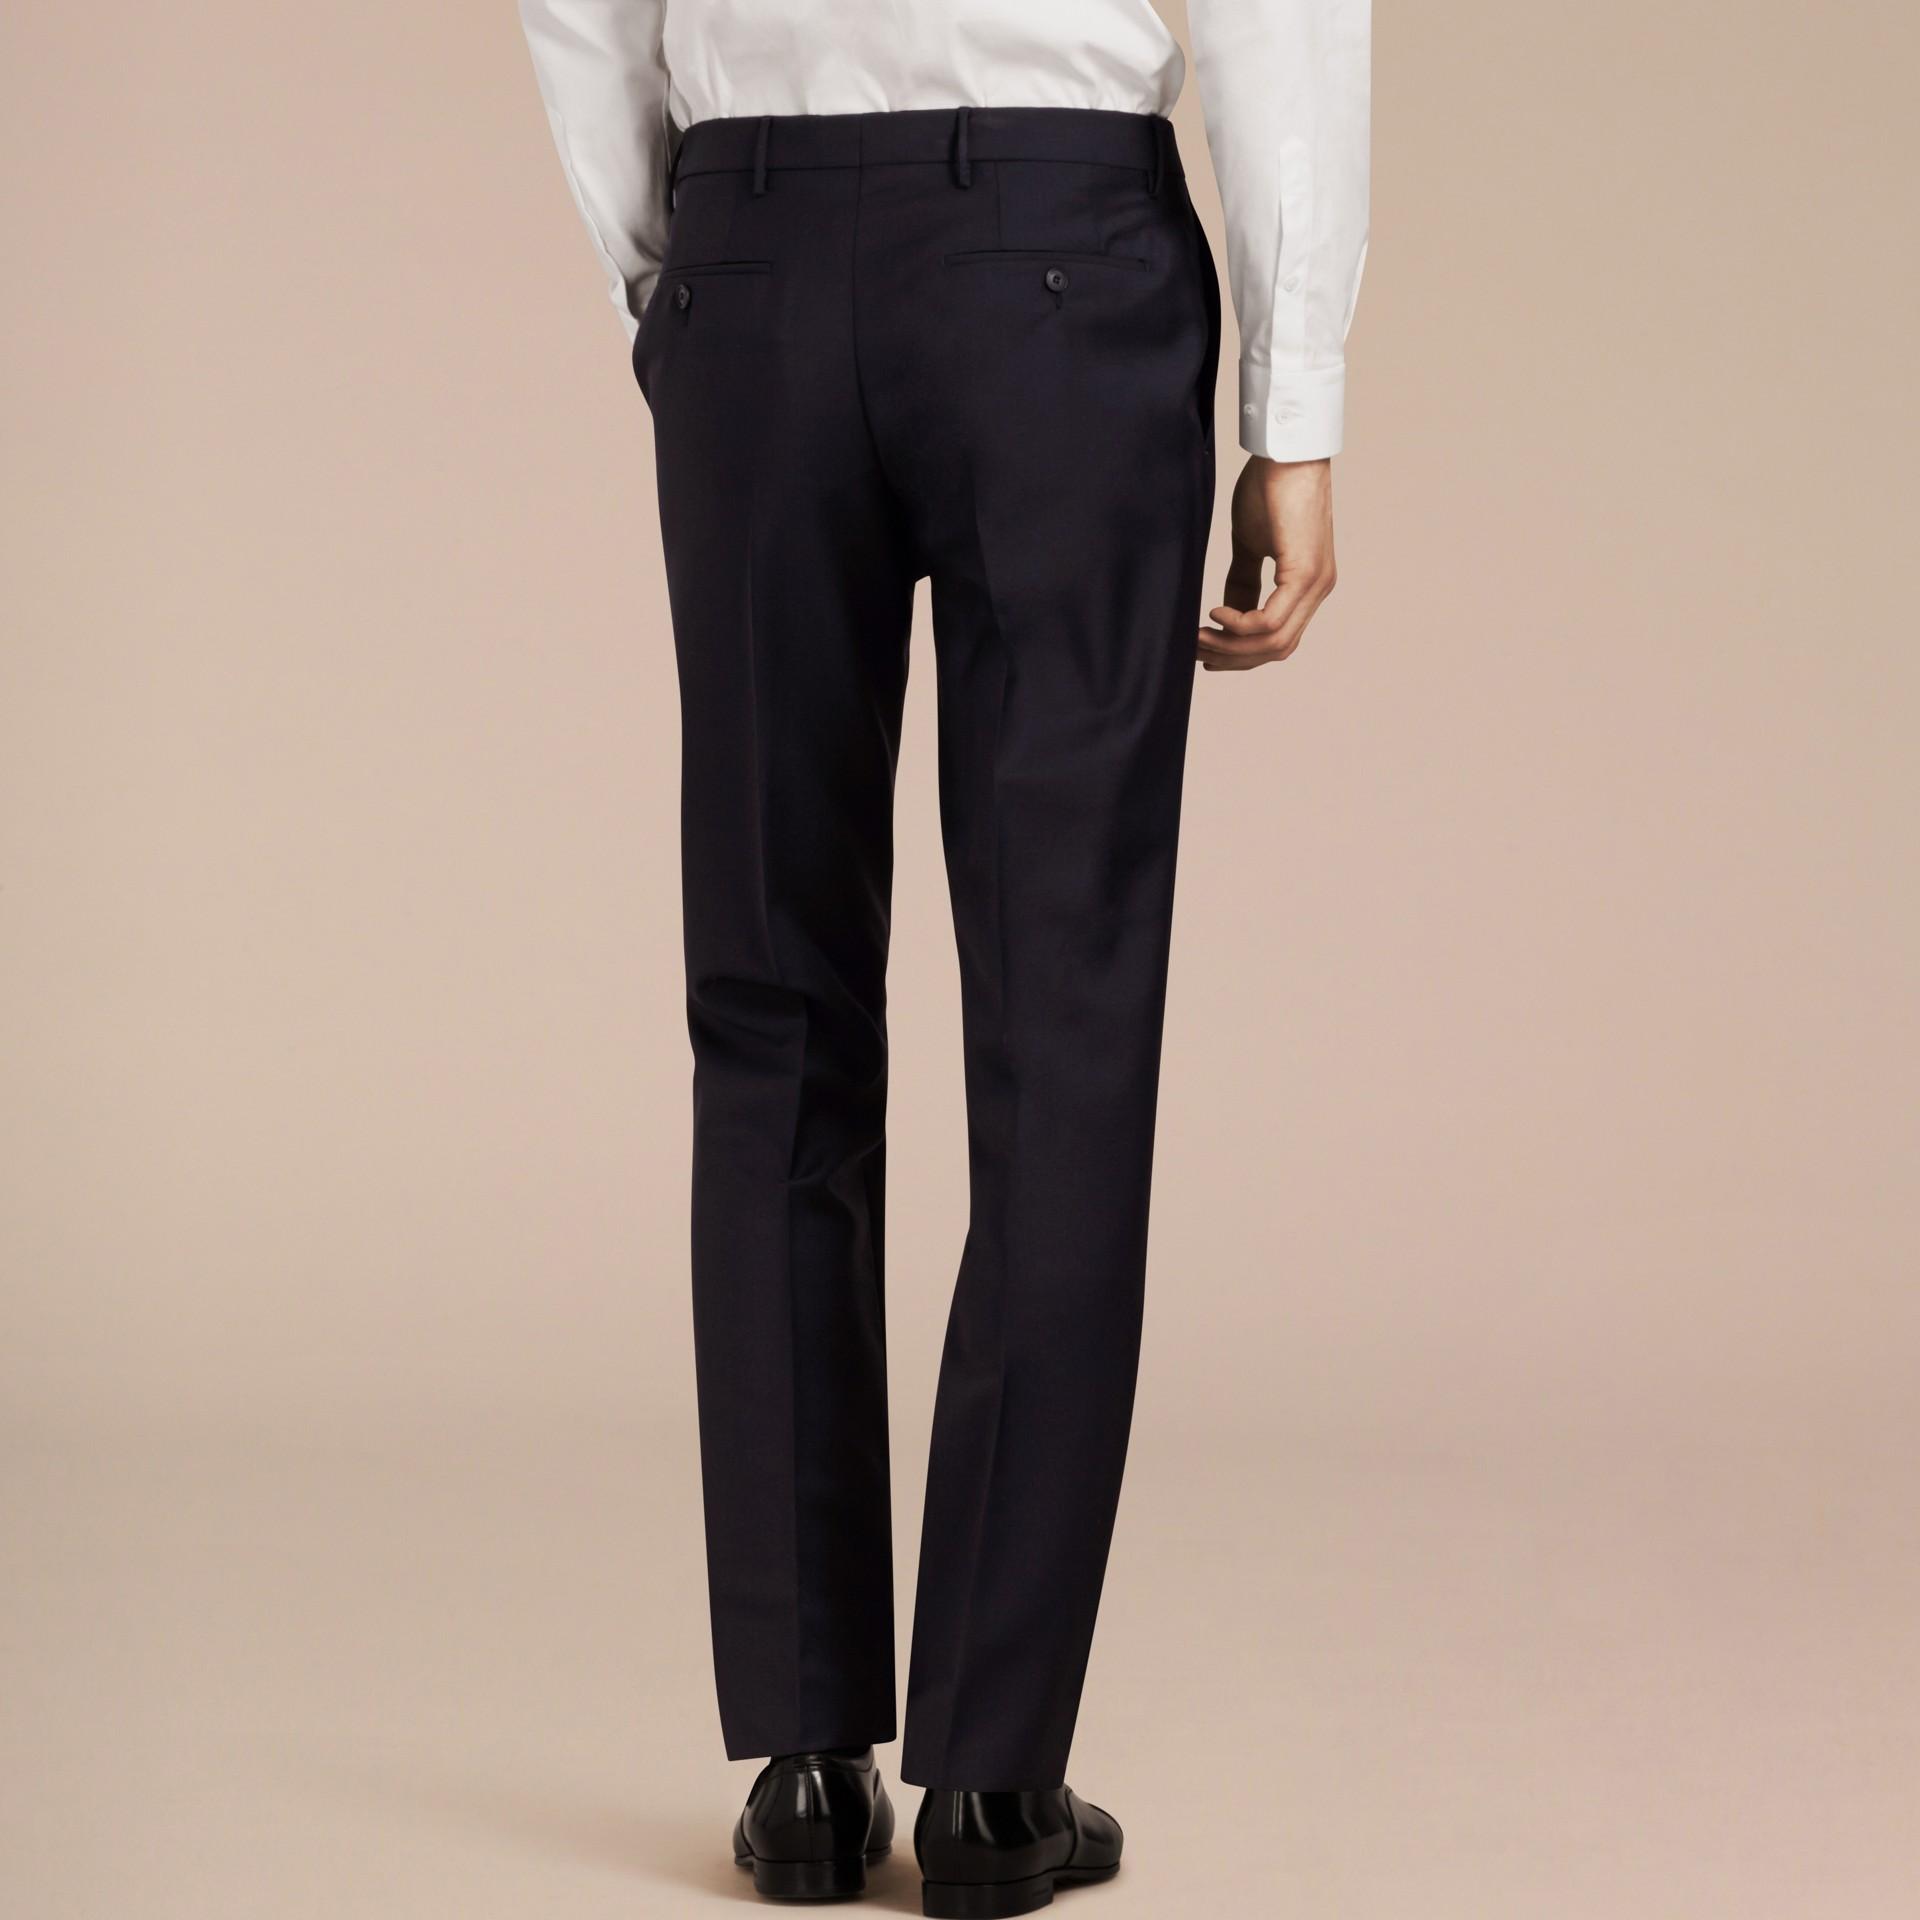 Marine véritable Pantalon de coupe moderne en laine et mohair Marine Véritable - photo de la galerie 3